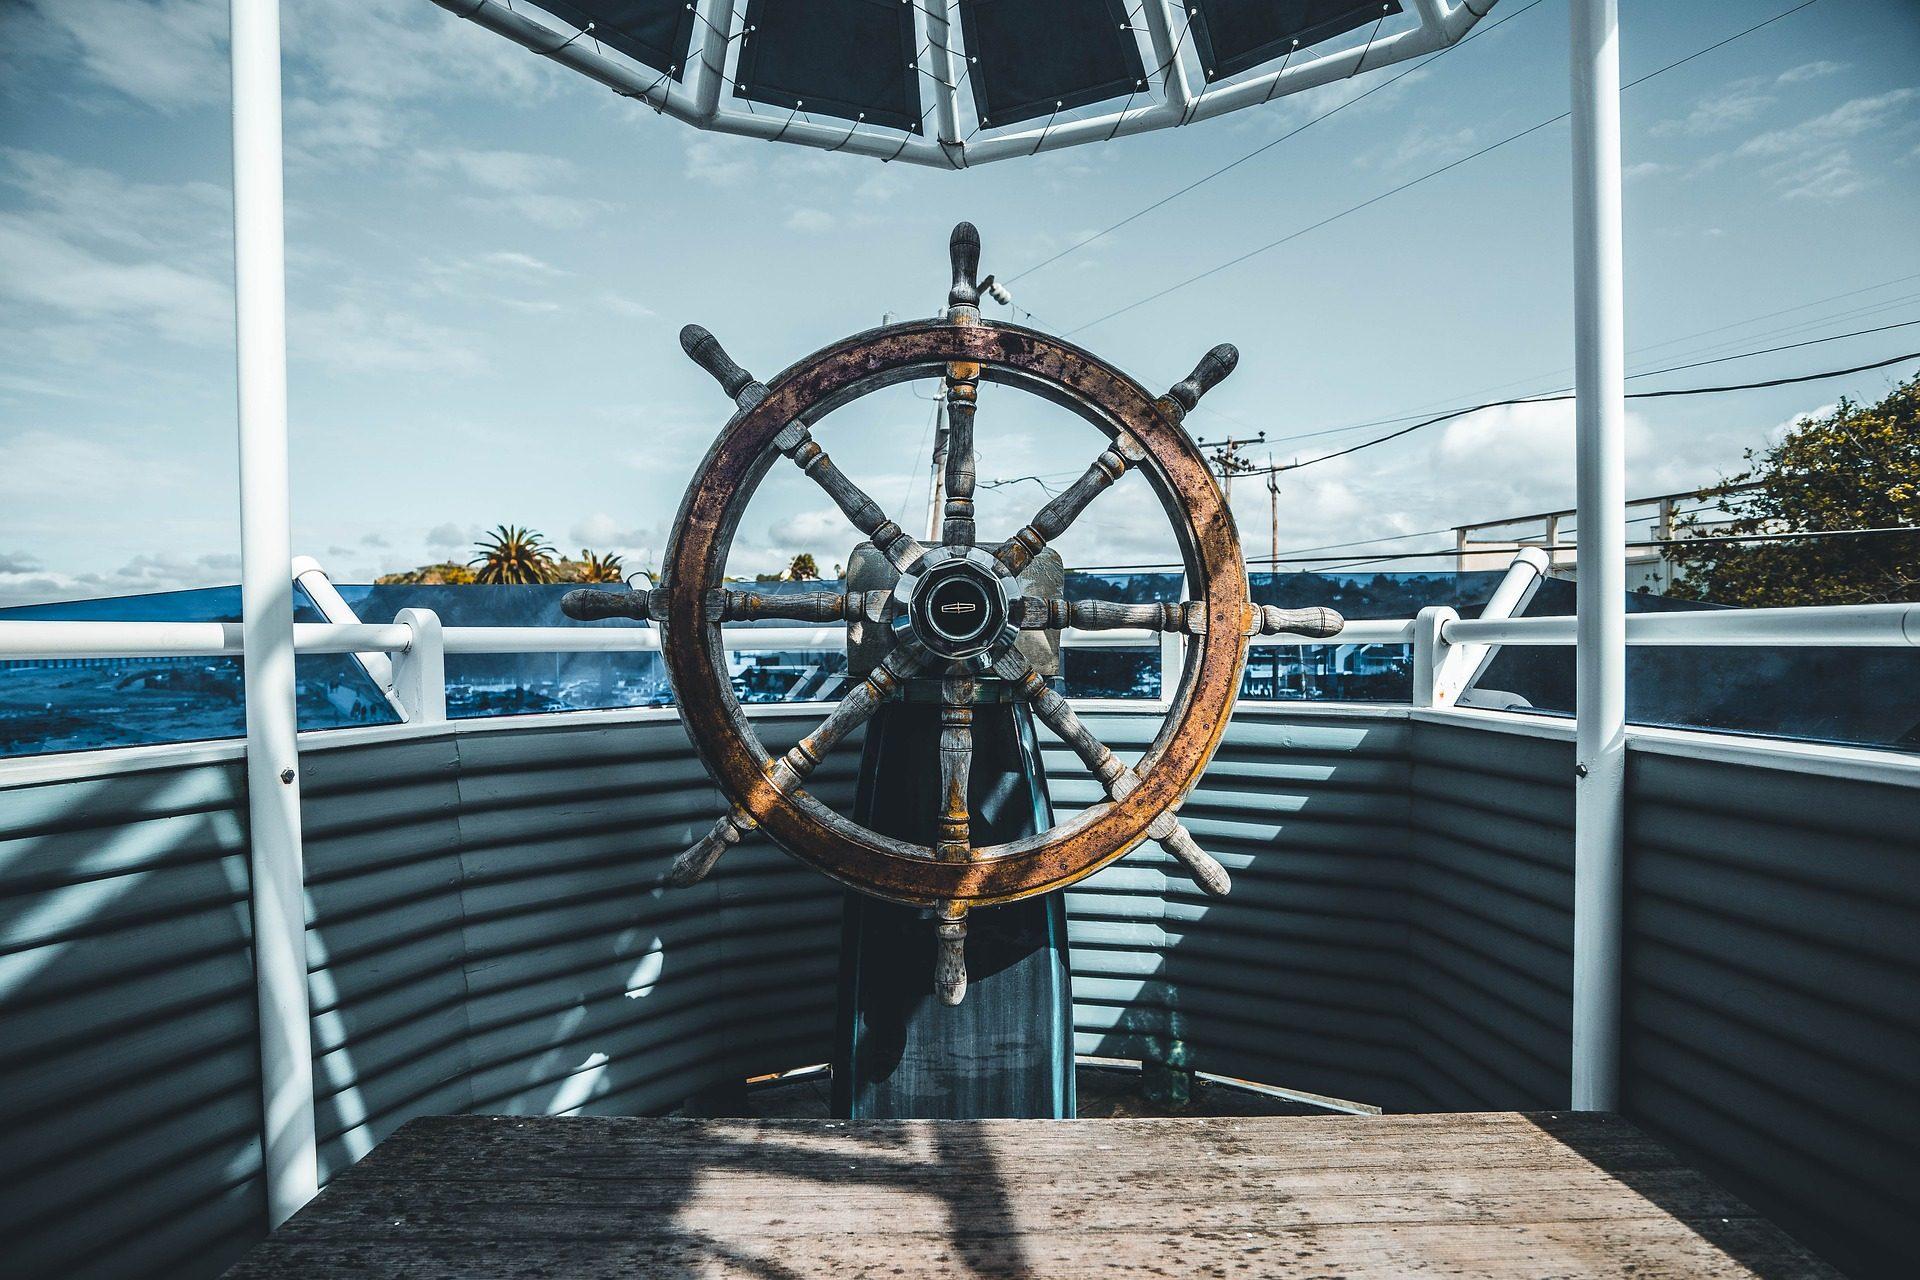 лодка, Timón, Dirección, Старый, Винтаж - Обои HD - Профессор falken.com